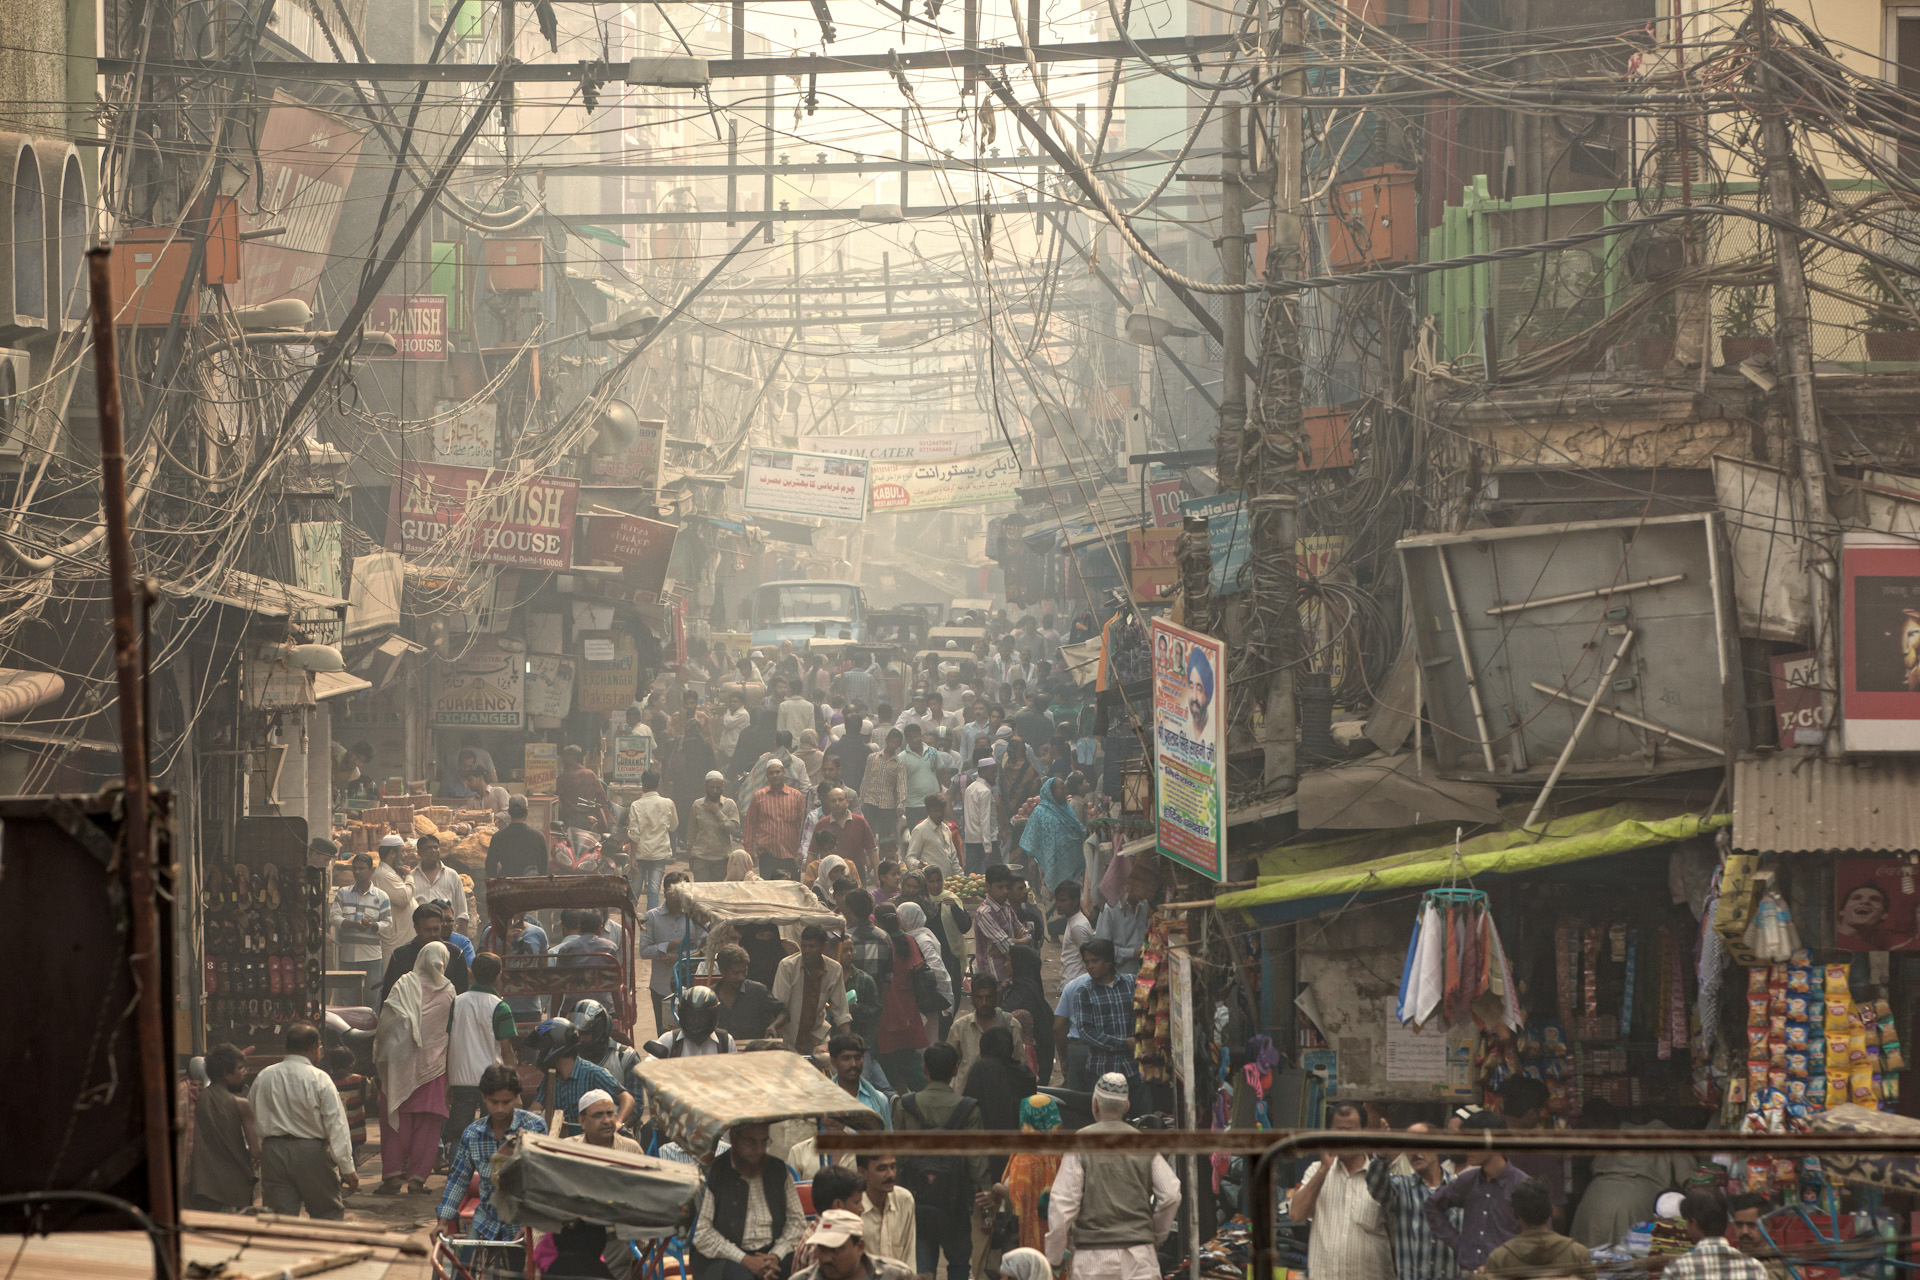 Jason_Bax_Travel_India-Travel-Old-Delhi-1.JPG